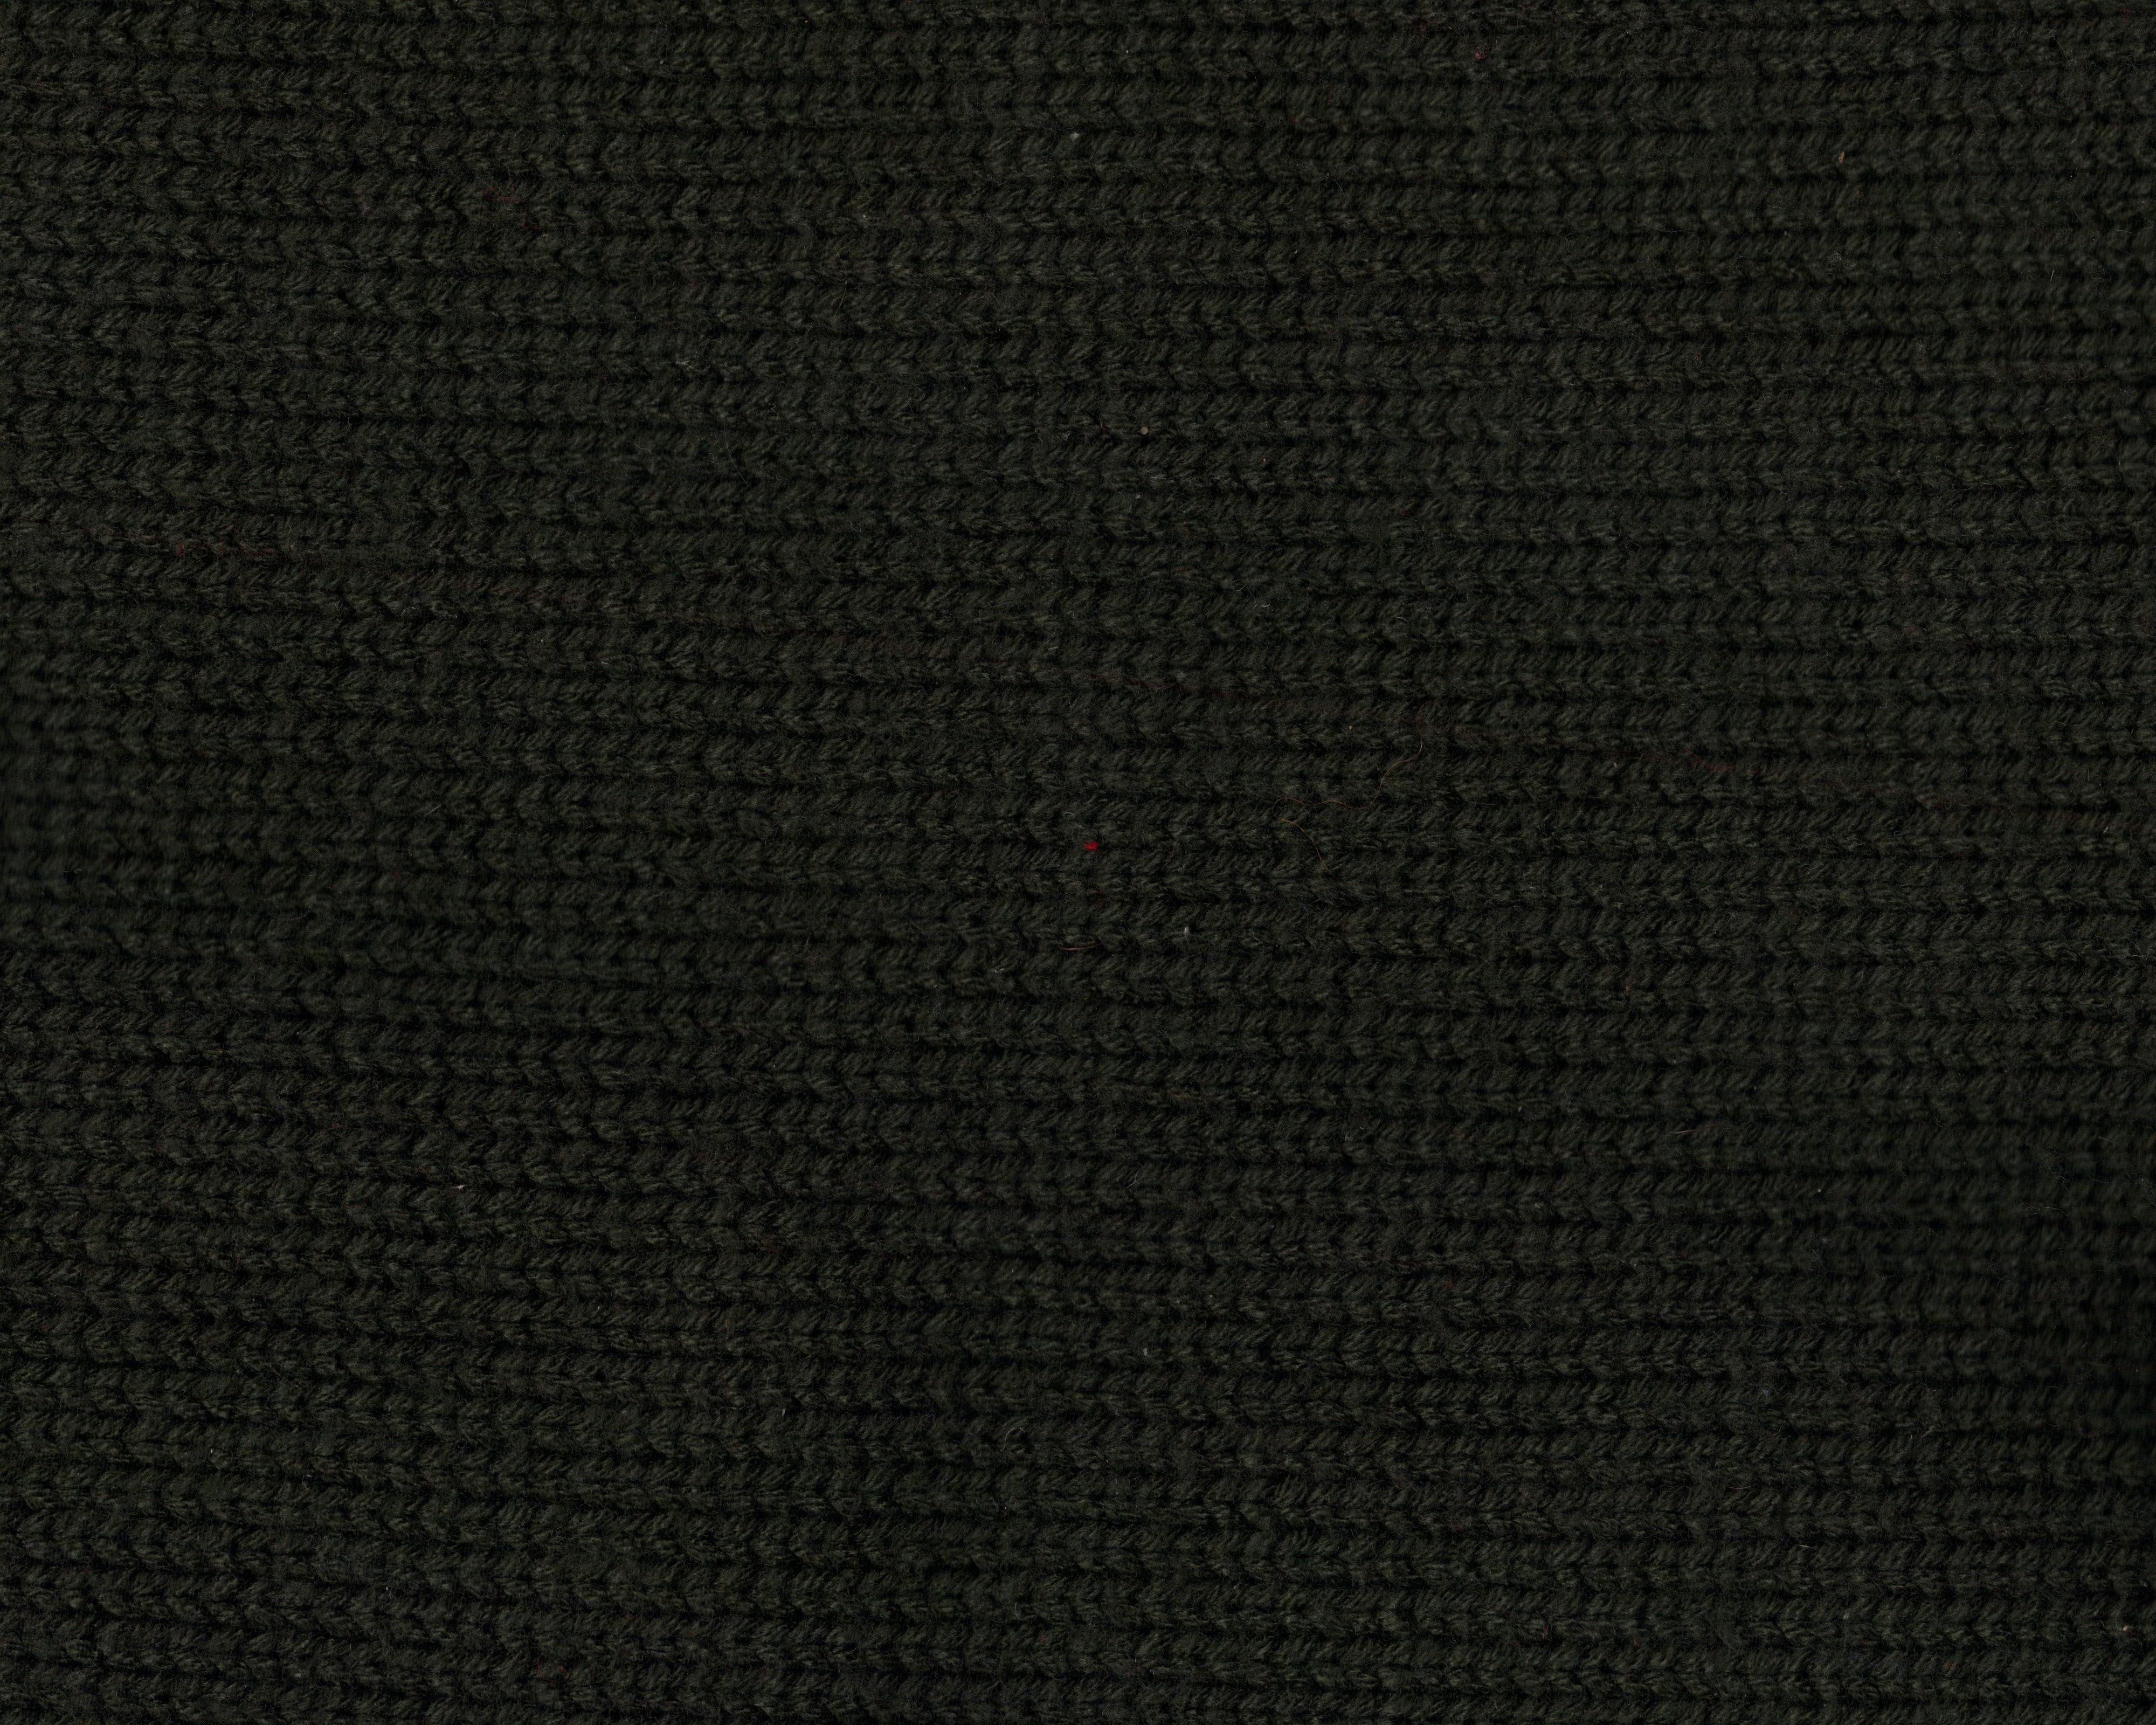 Fabric Textures (JPG) | OnlyGFX.com